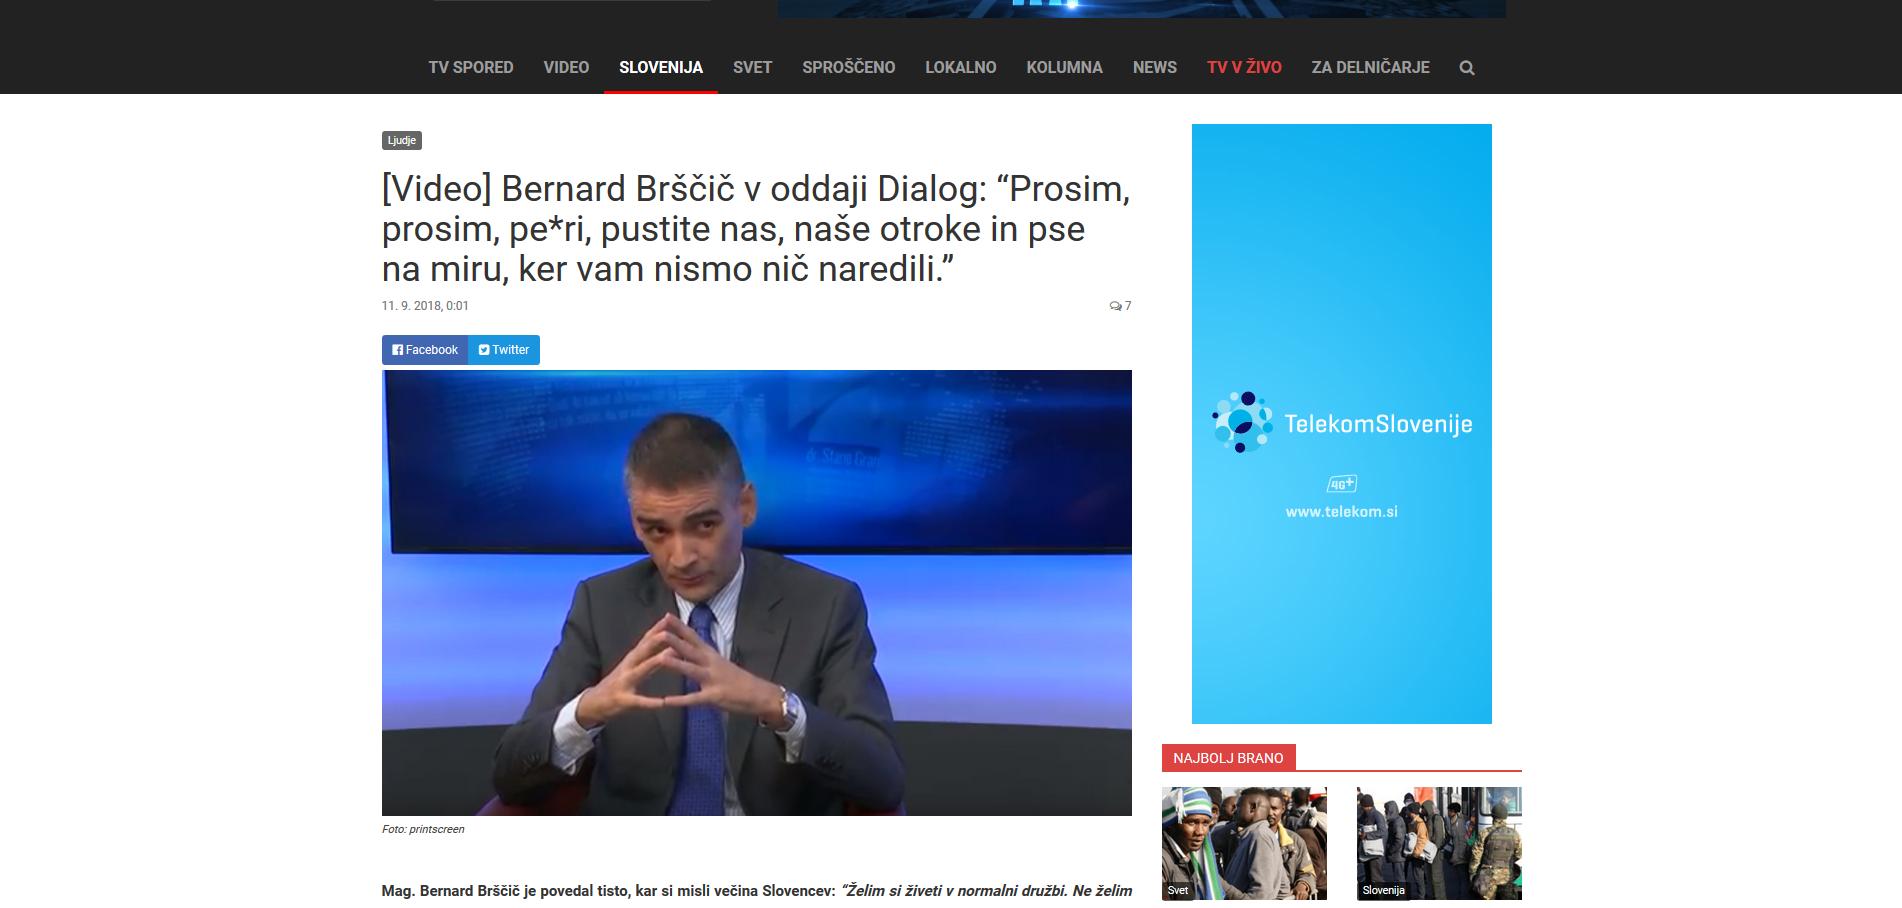 Telekom Slovenije, nehaj financirati sovraštvo